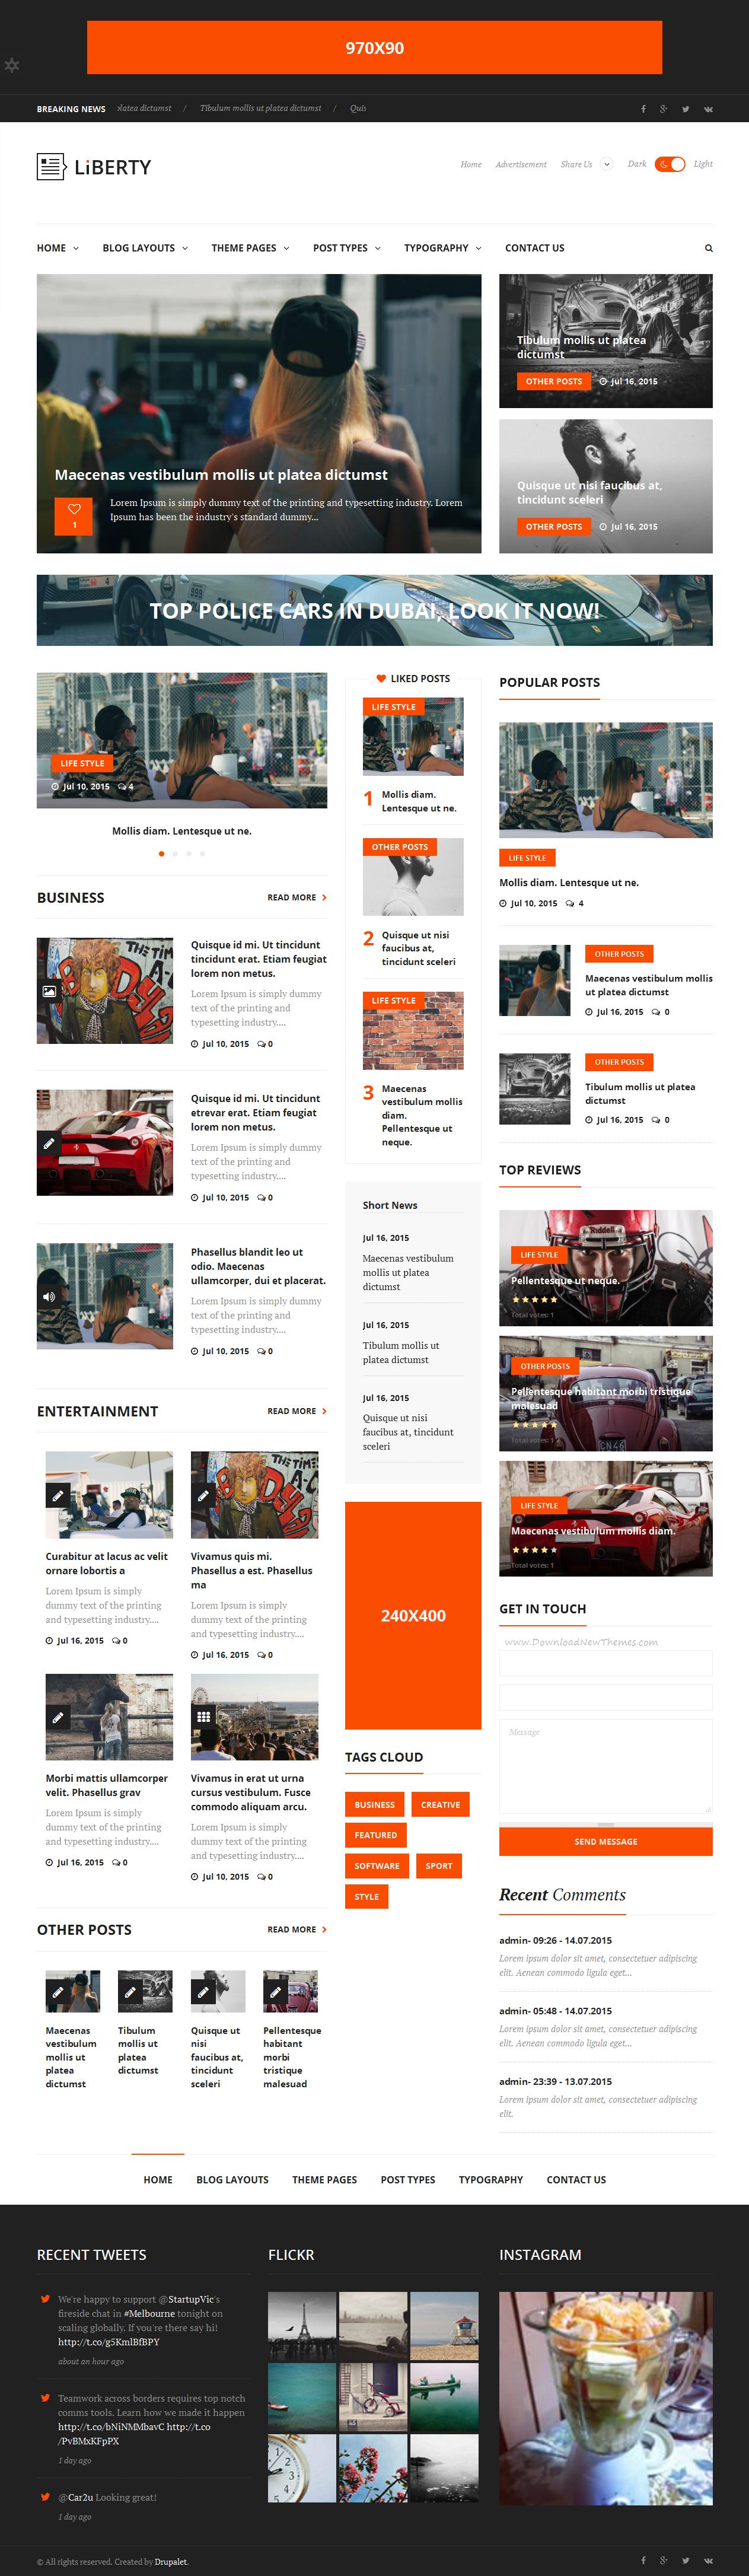 Liberty News Magazine Blog Drupal Theme Drupal Website Designs - News website design template